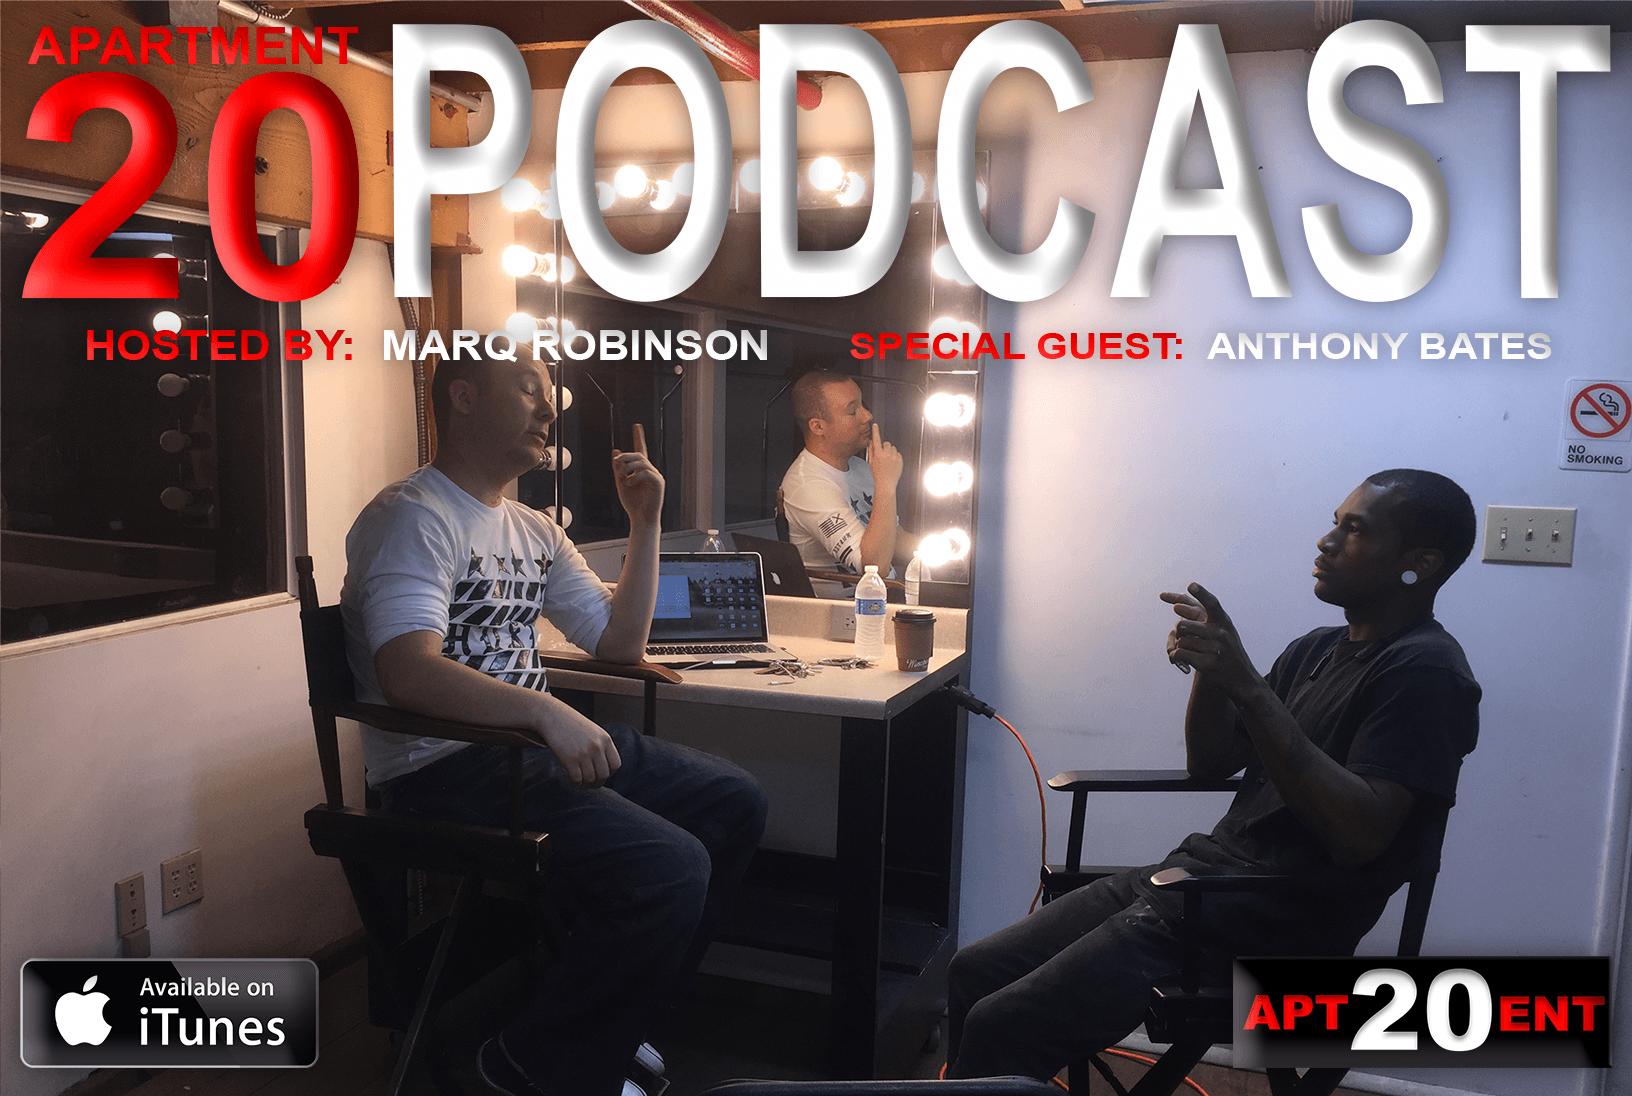 Apartment 20 Podcast: Anthony Bates